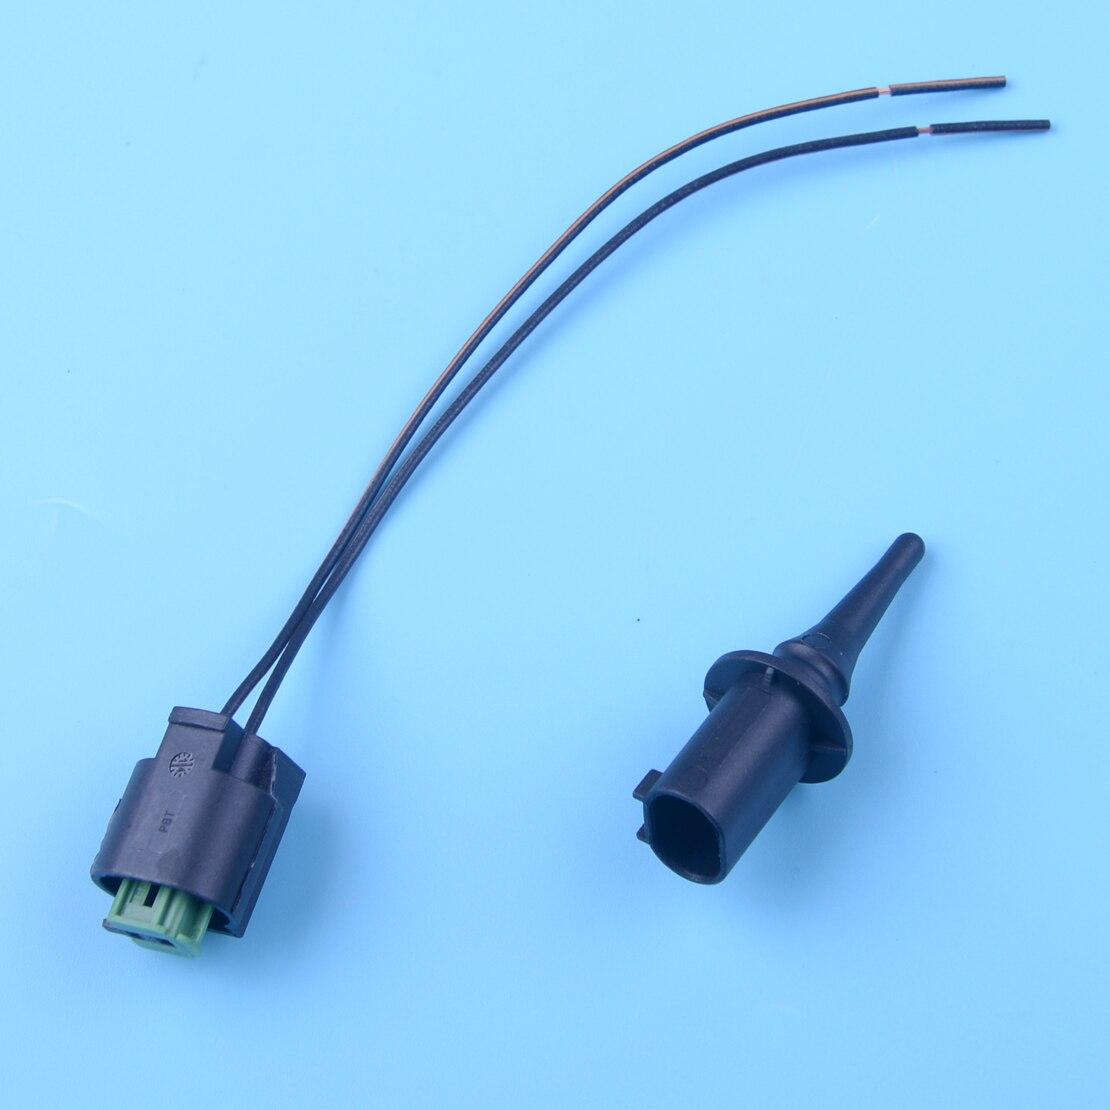 CITALL Outer Ambient Air Temperature Sensor & Plug For Mercedes Benz C E CLK CLS GLK Smart Sprinter Vaneo VW Crafter 0075421318